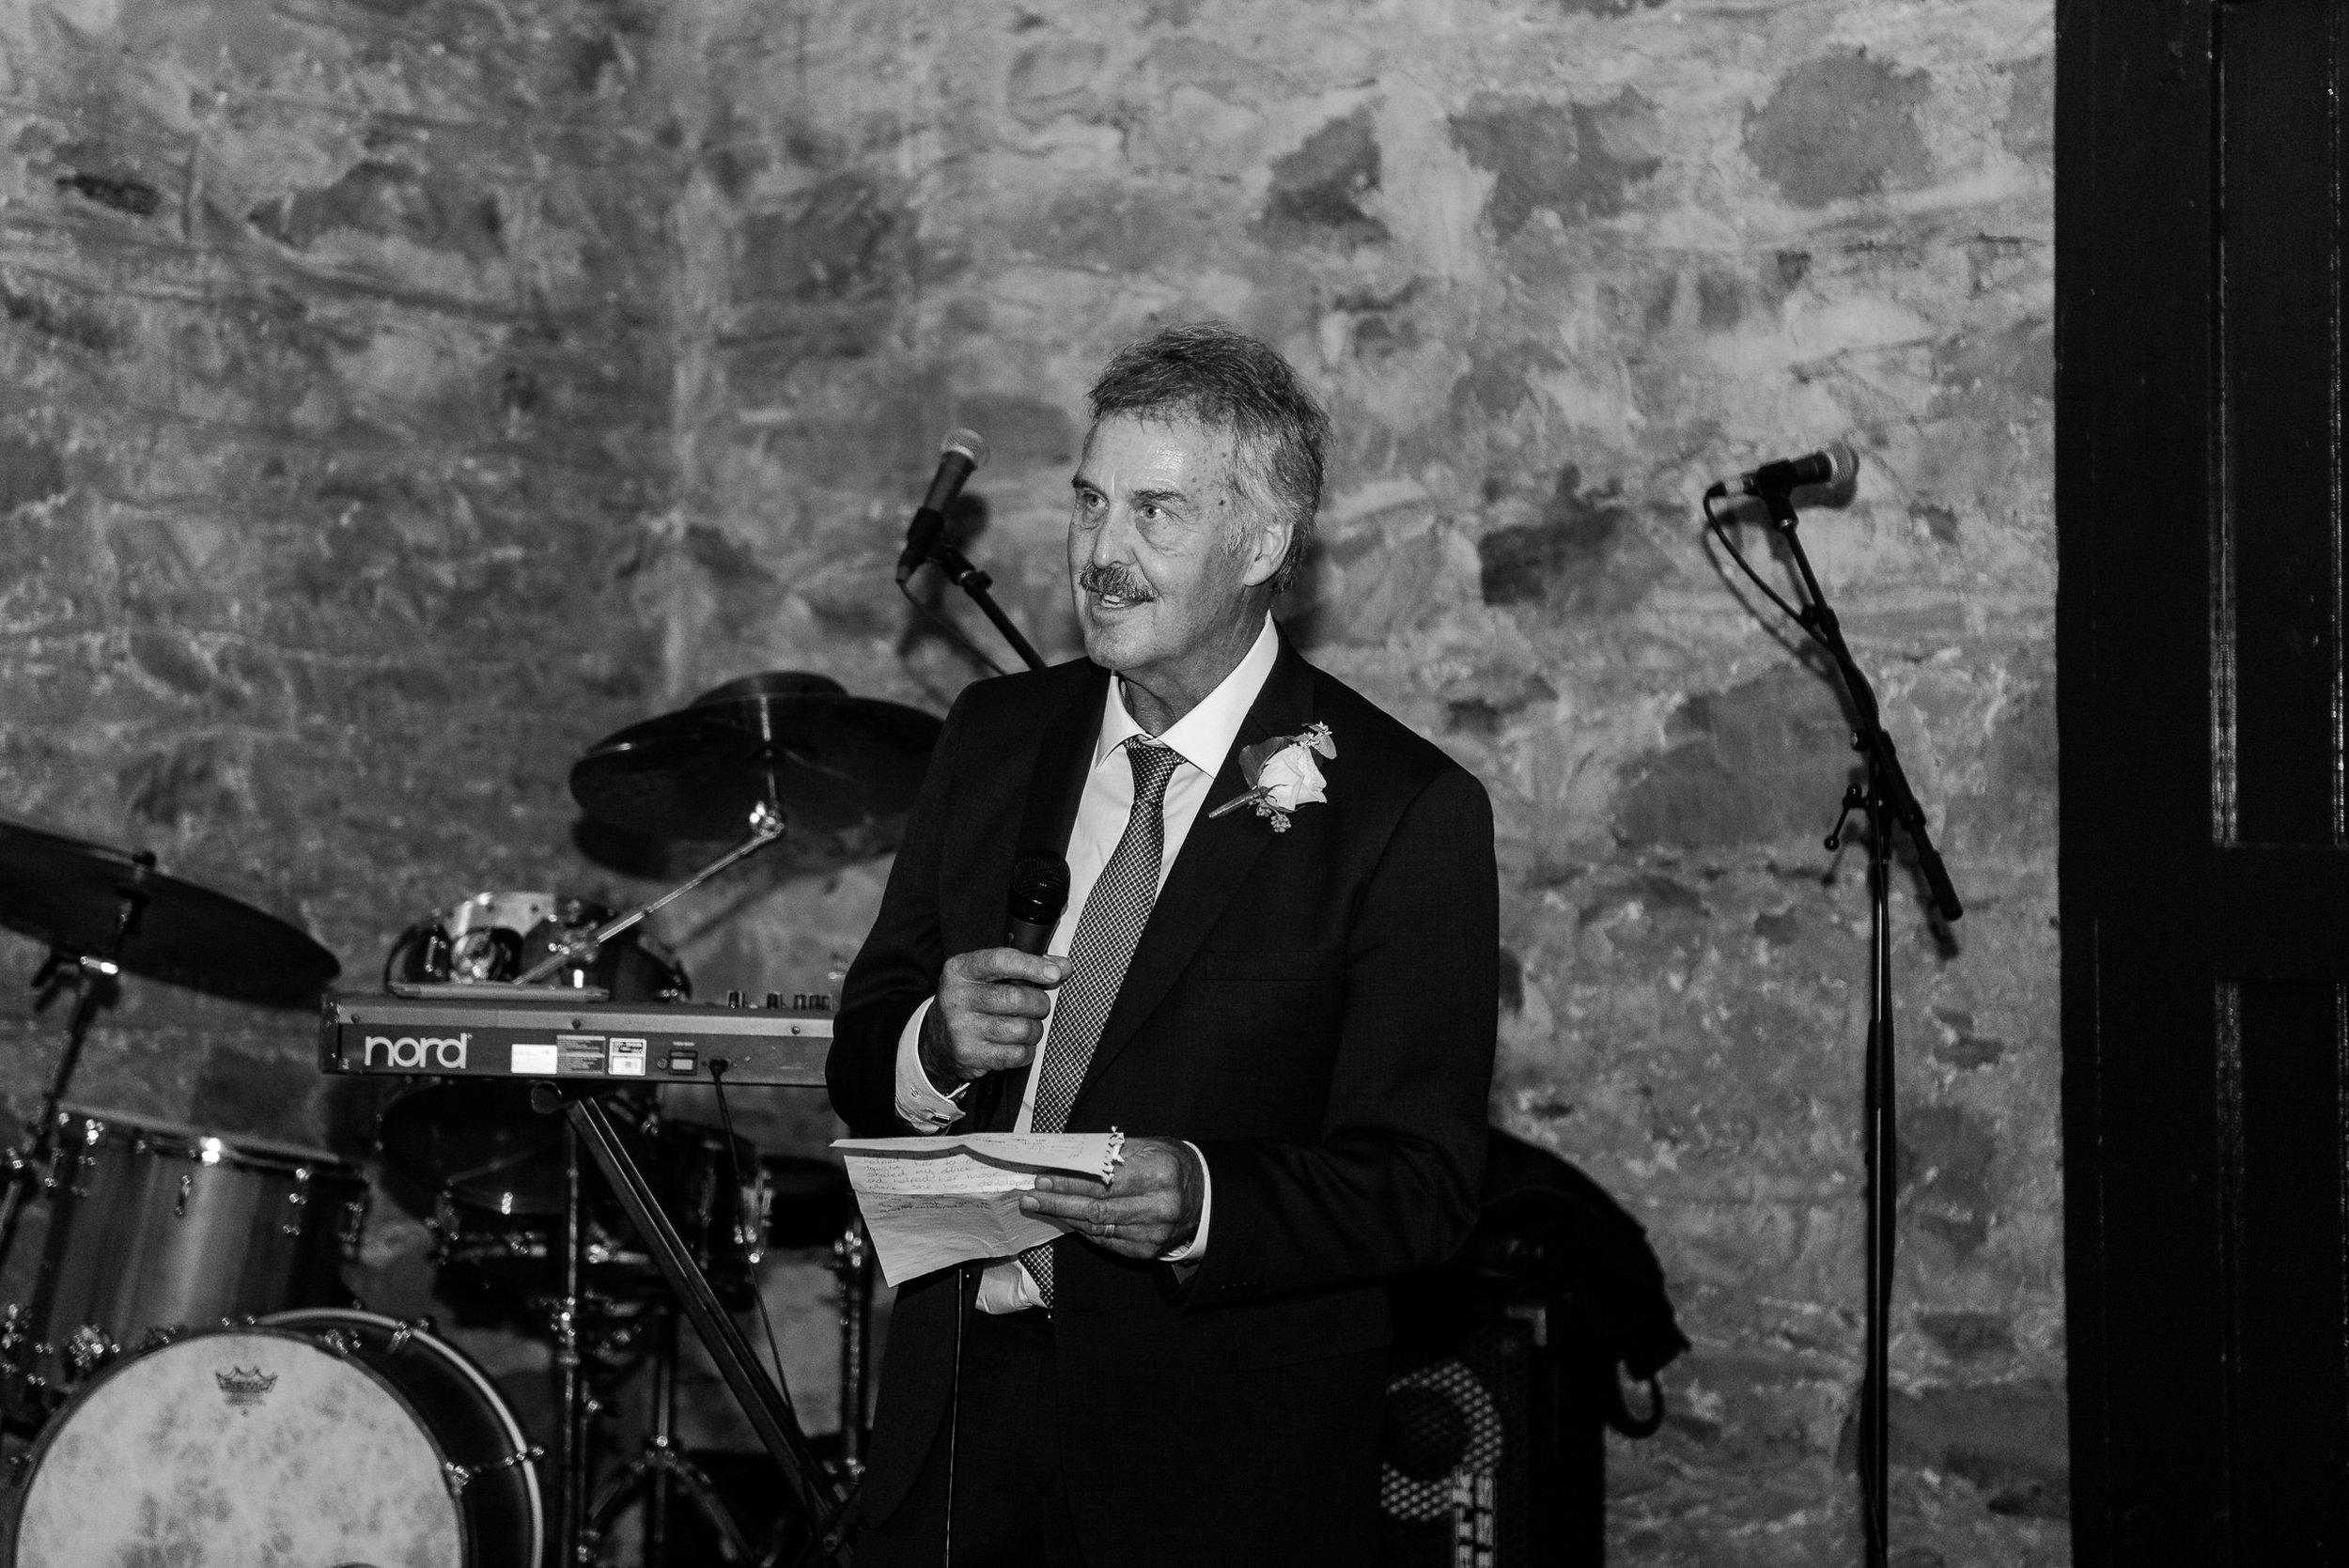 Justin_And_Jim_Photography_Chateau_Dore_Bendigo_Wedding82.JPG